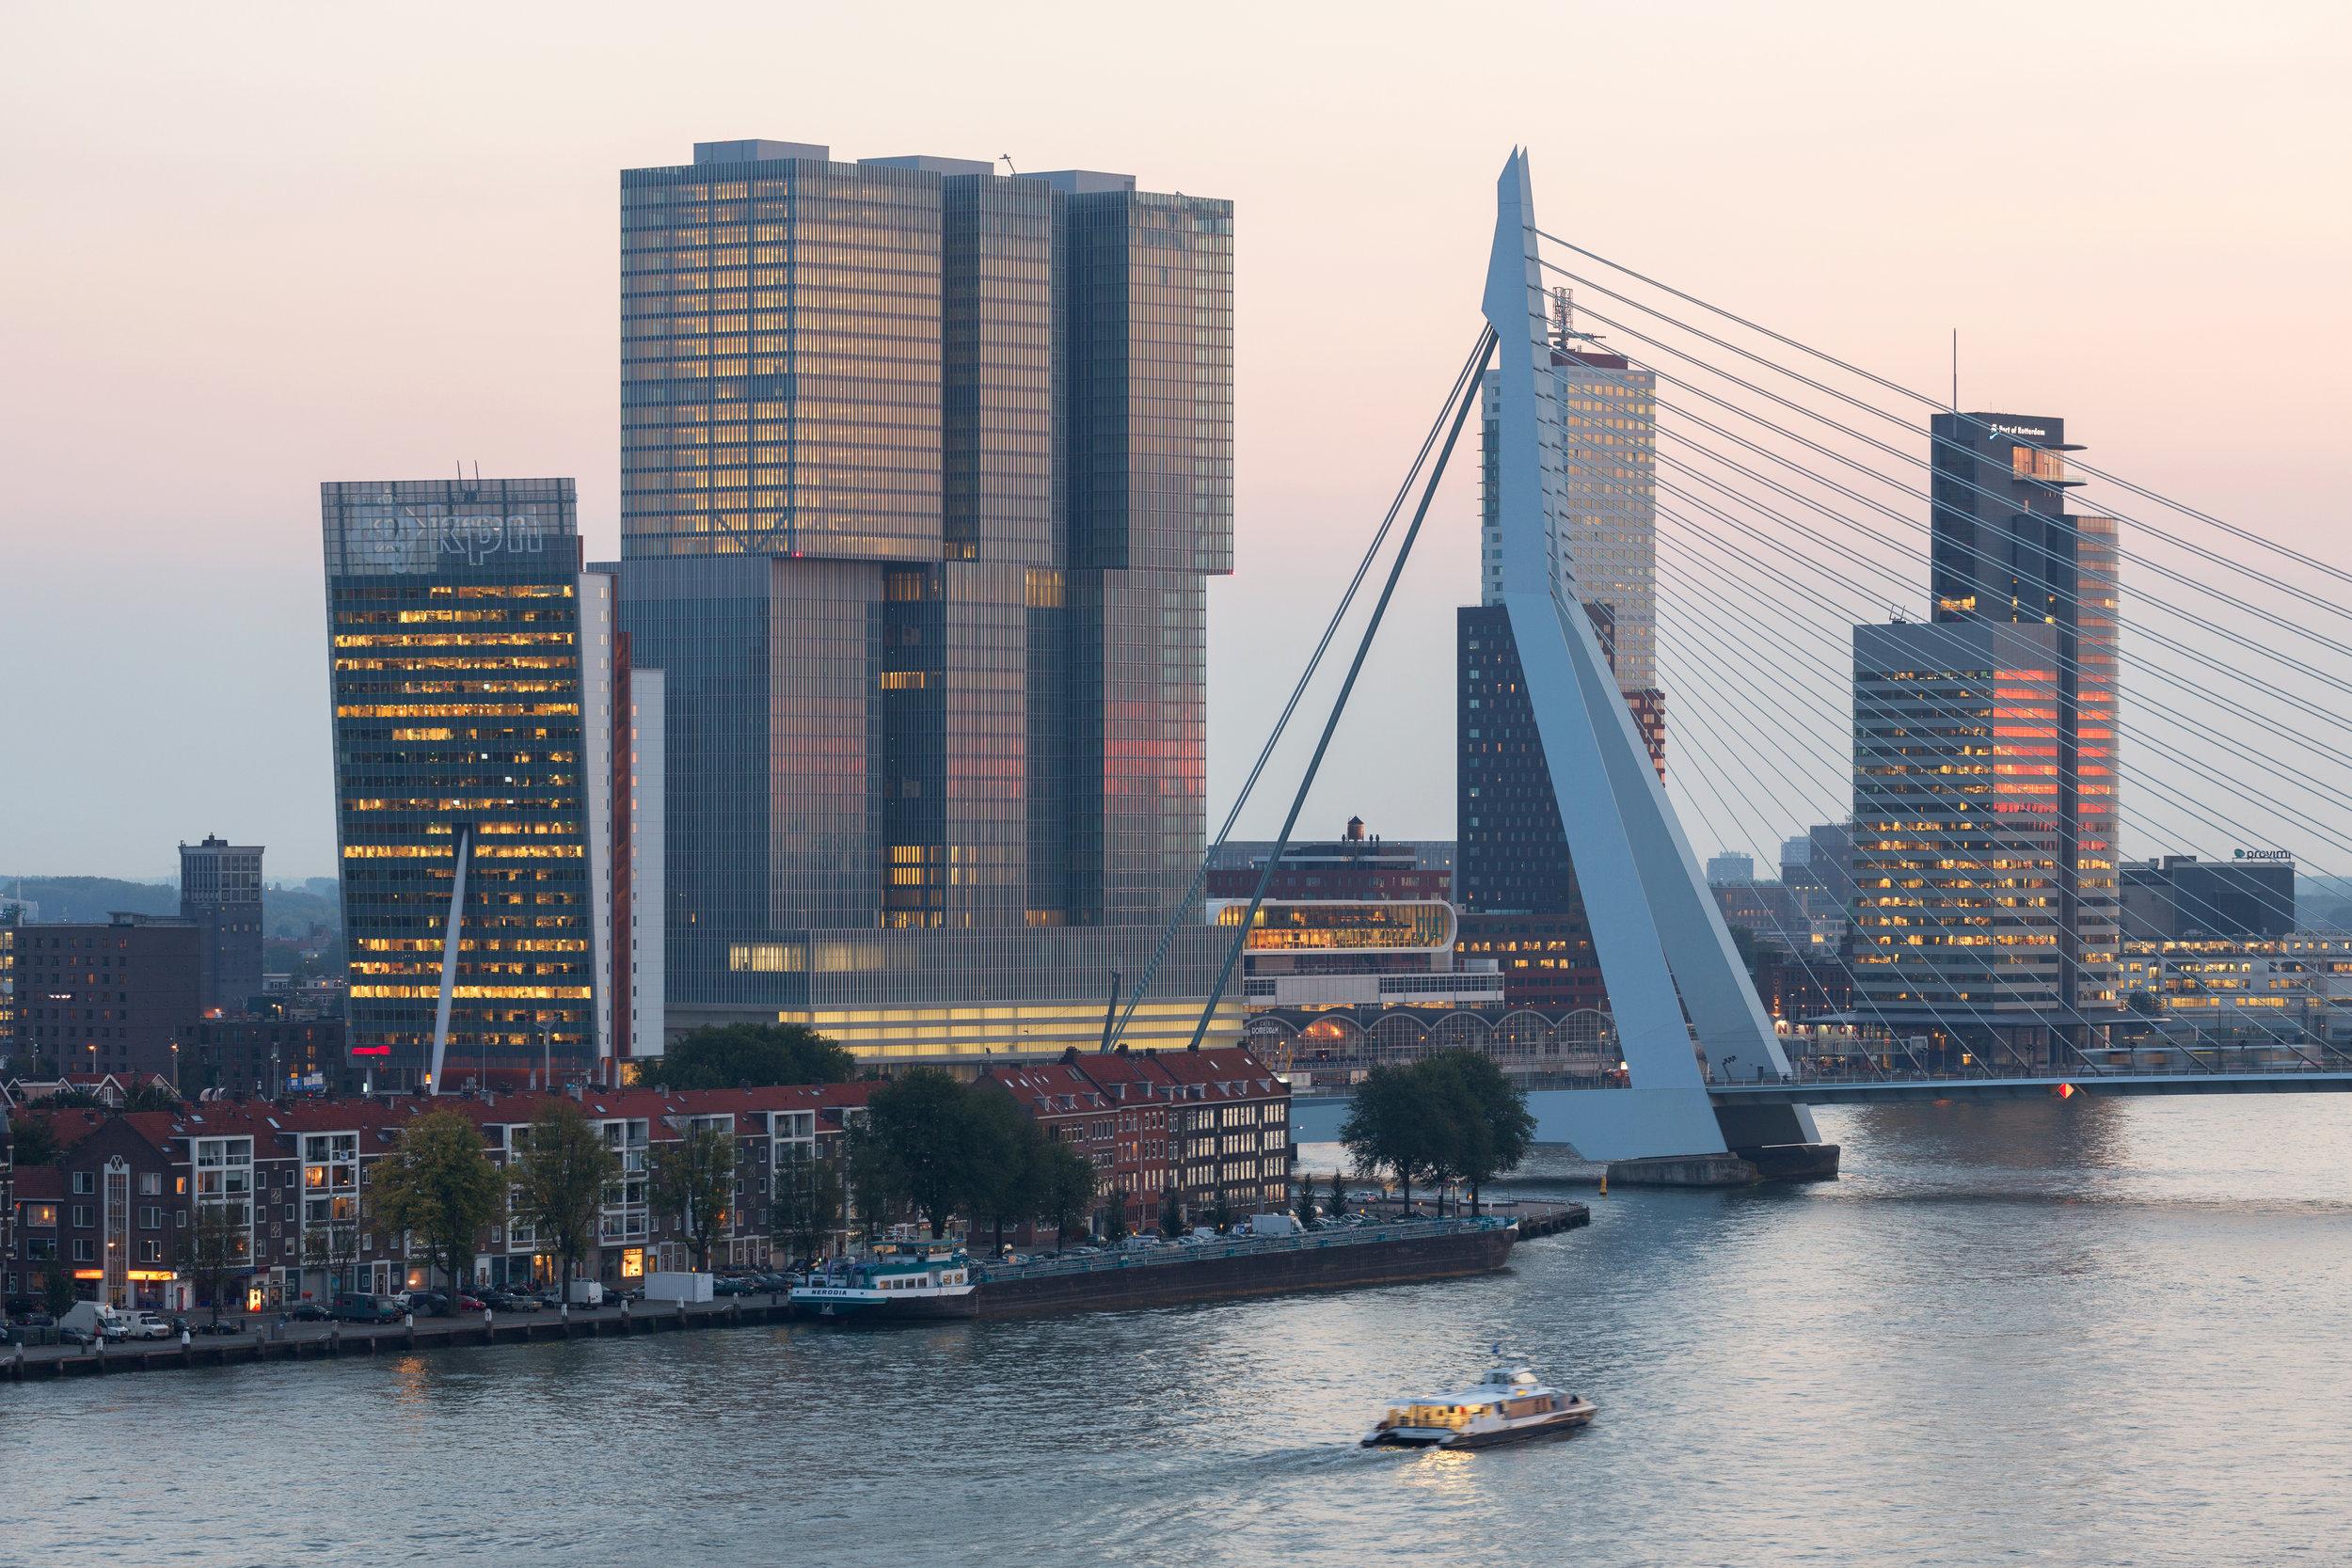 1448-Rotterdam-Image-Bank-RoyaltyFree.jpg